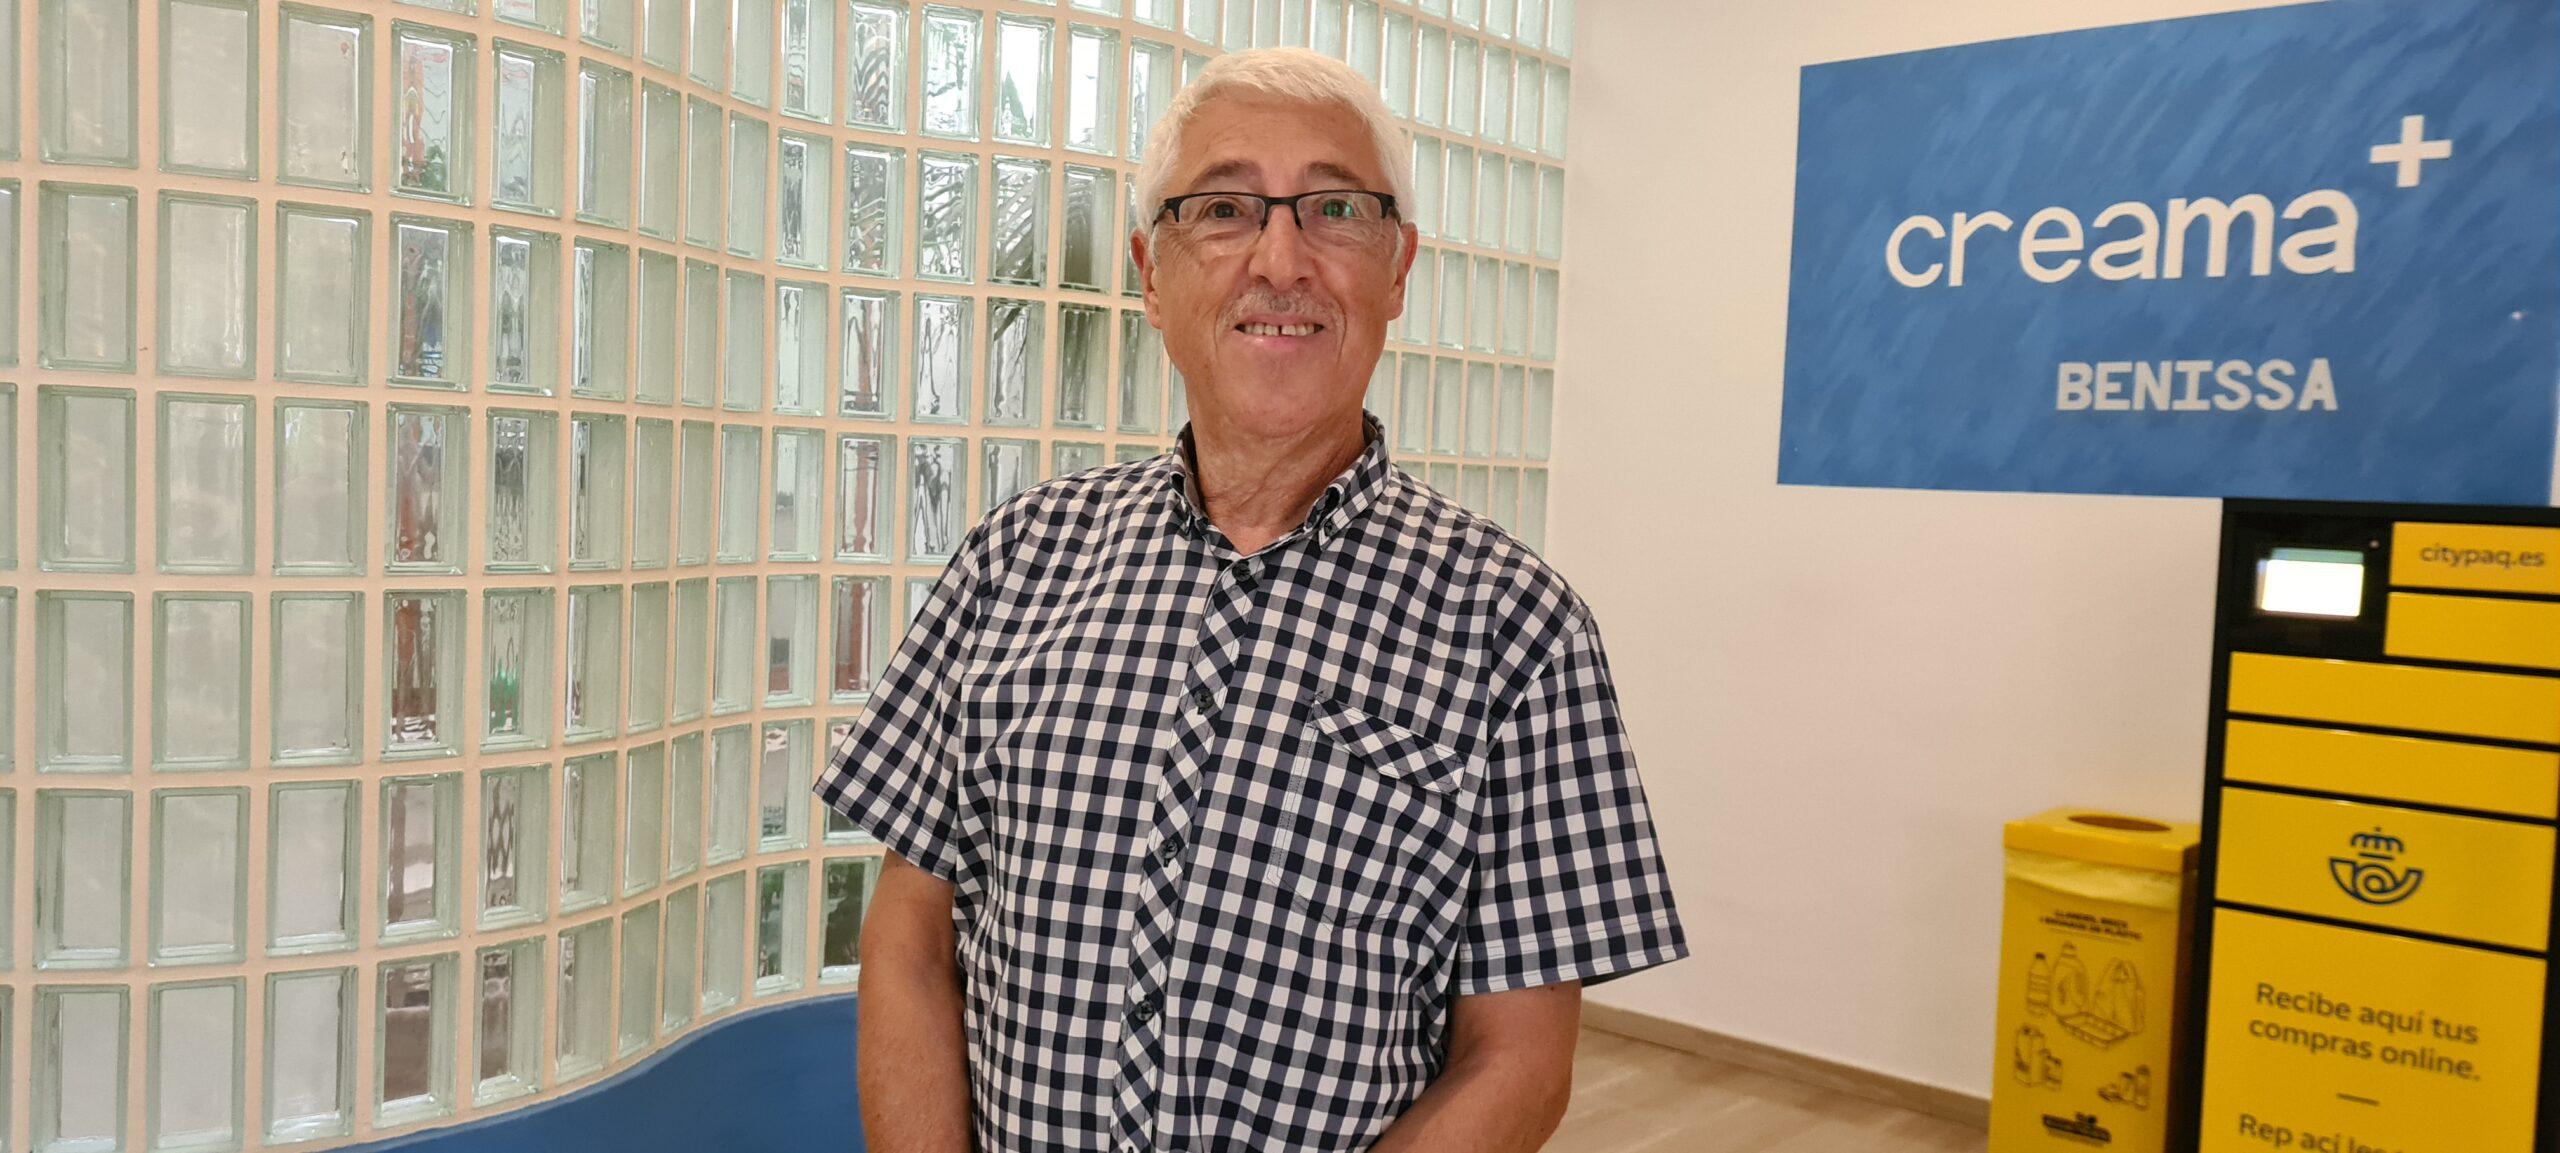 Juan Antonio Ivars